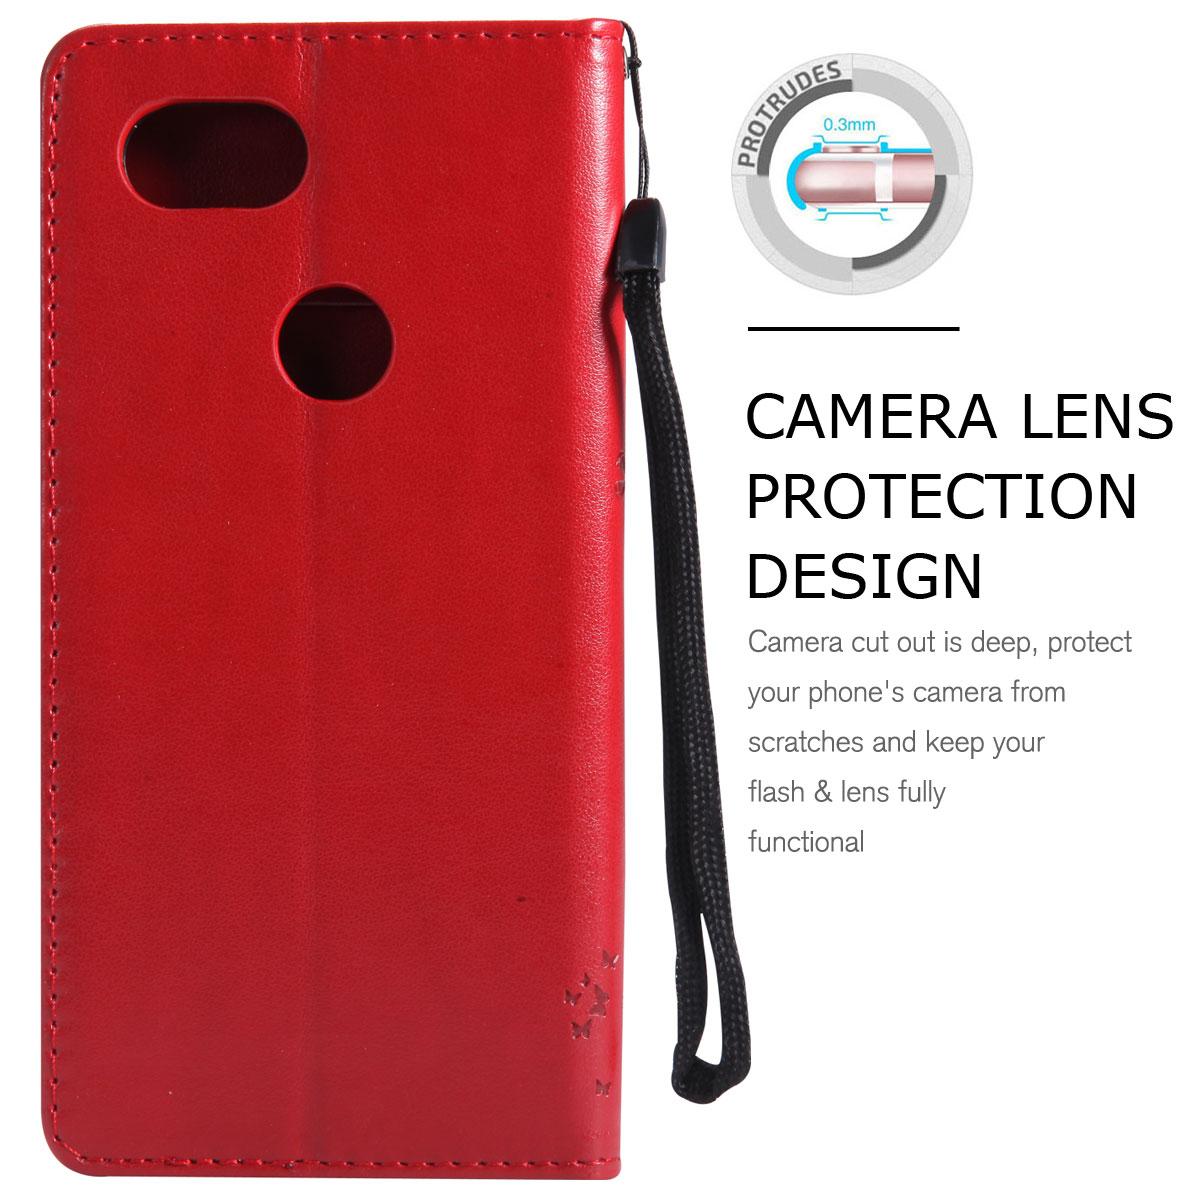 Magnetic-Leather-Credit-Card-Holder-Flip-Case-Cover-For-Google-Pixel-2-2-XL thumbnail 63